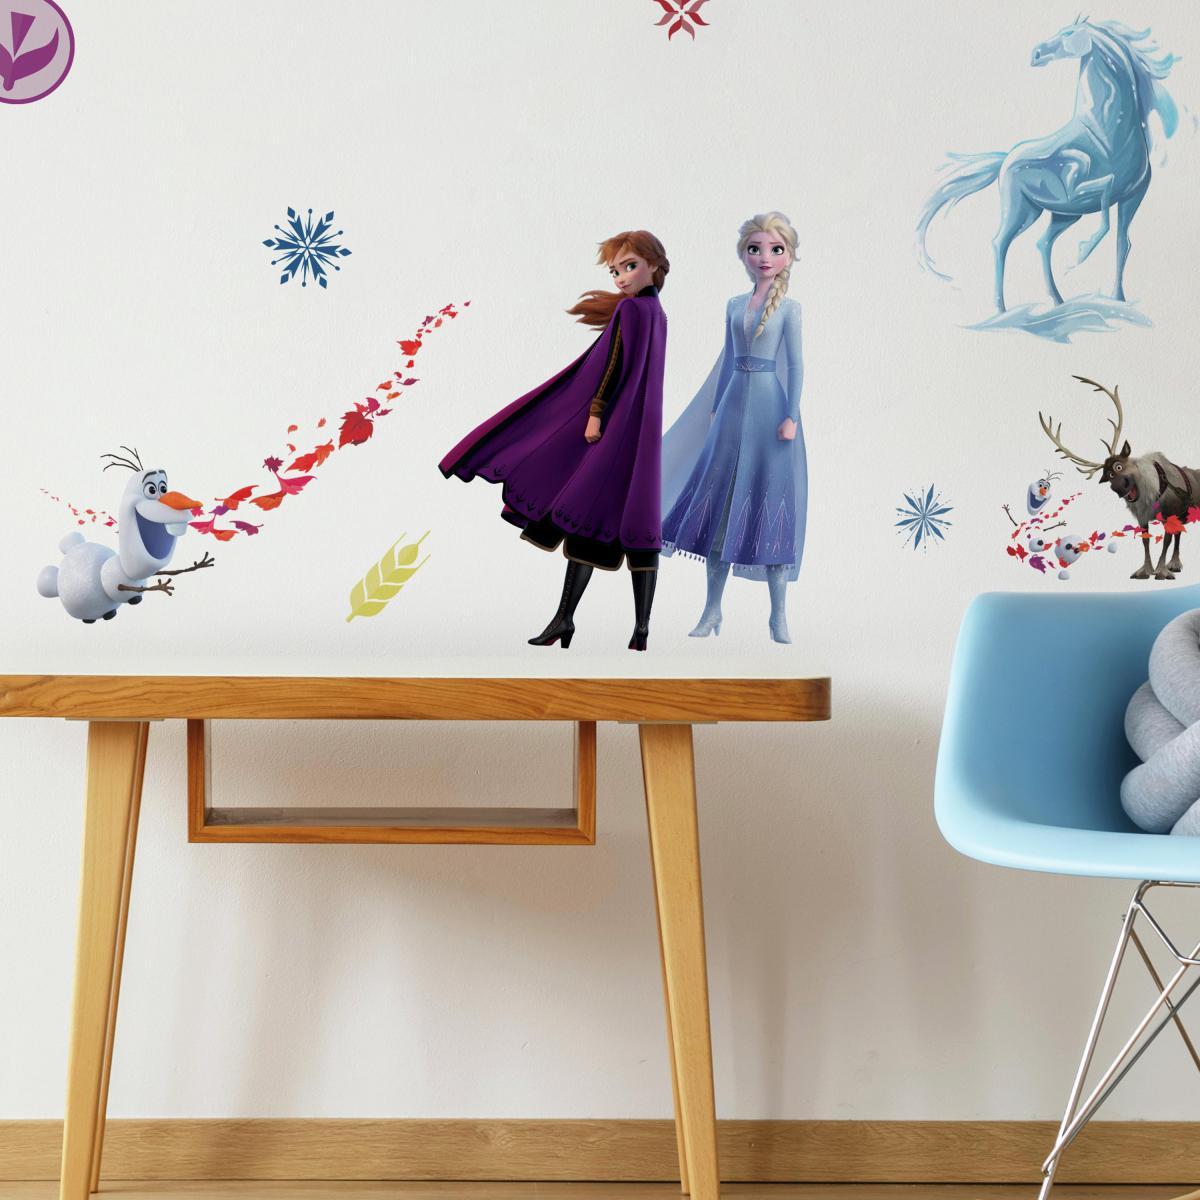 Roommates Stickers mural La Reine des Neiges 2 Disney Frozen